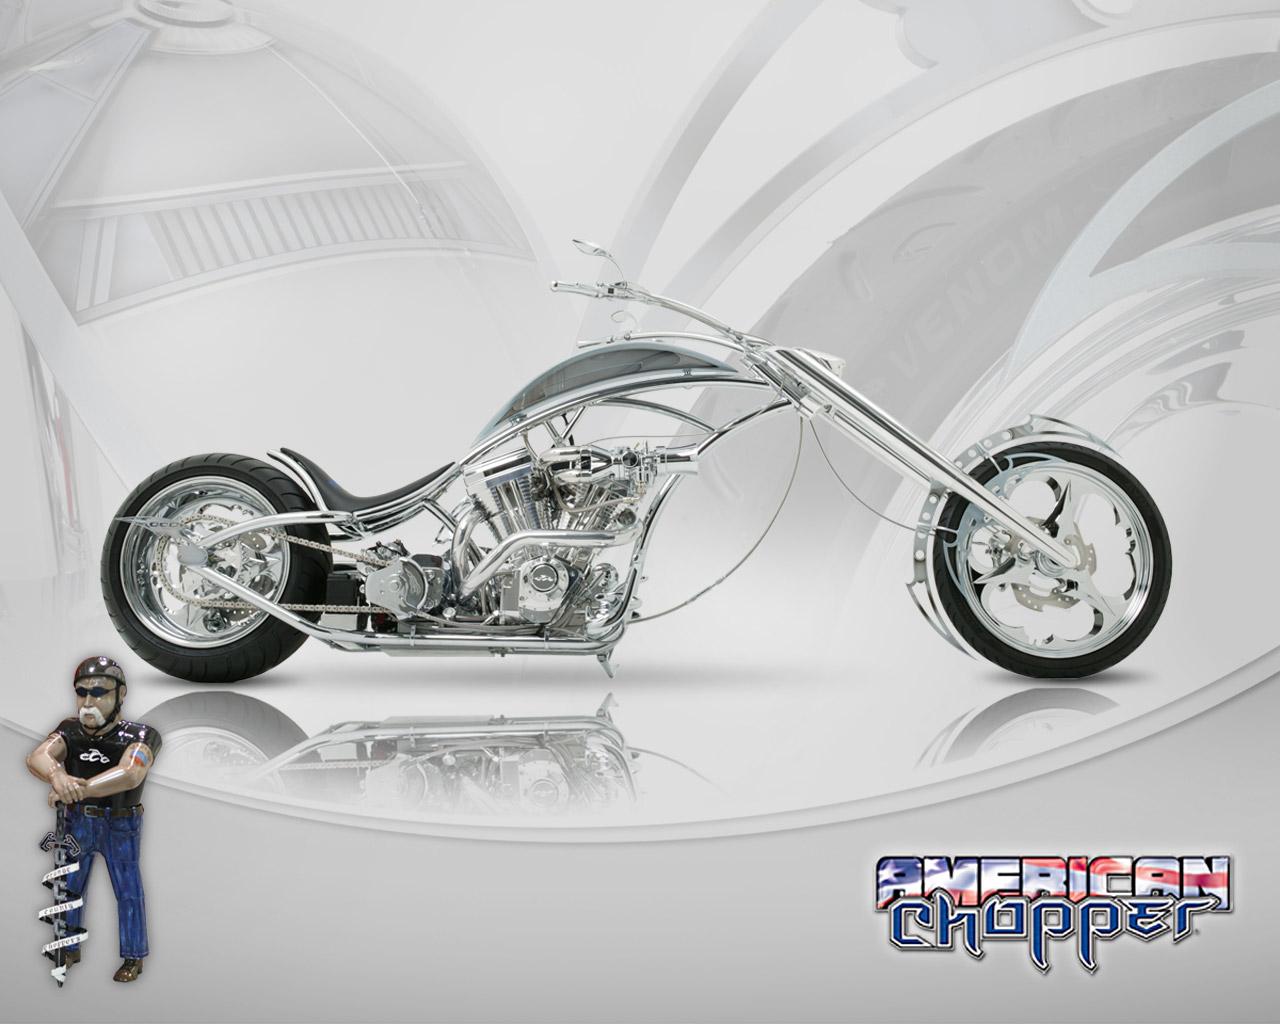 American chopper   Orange County Choppers Wallpaper 124421 1280x1024